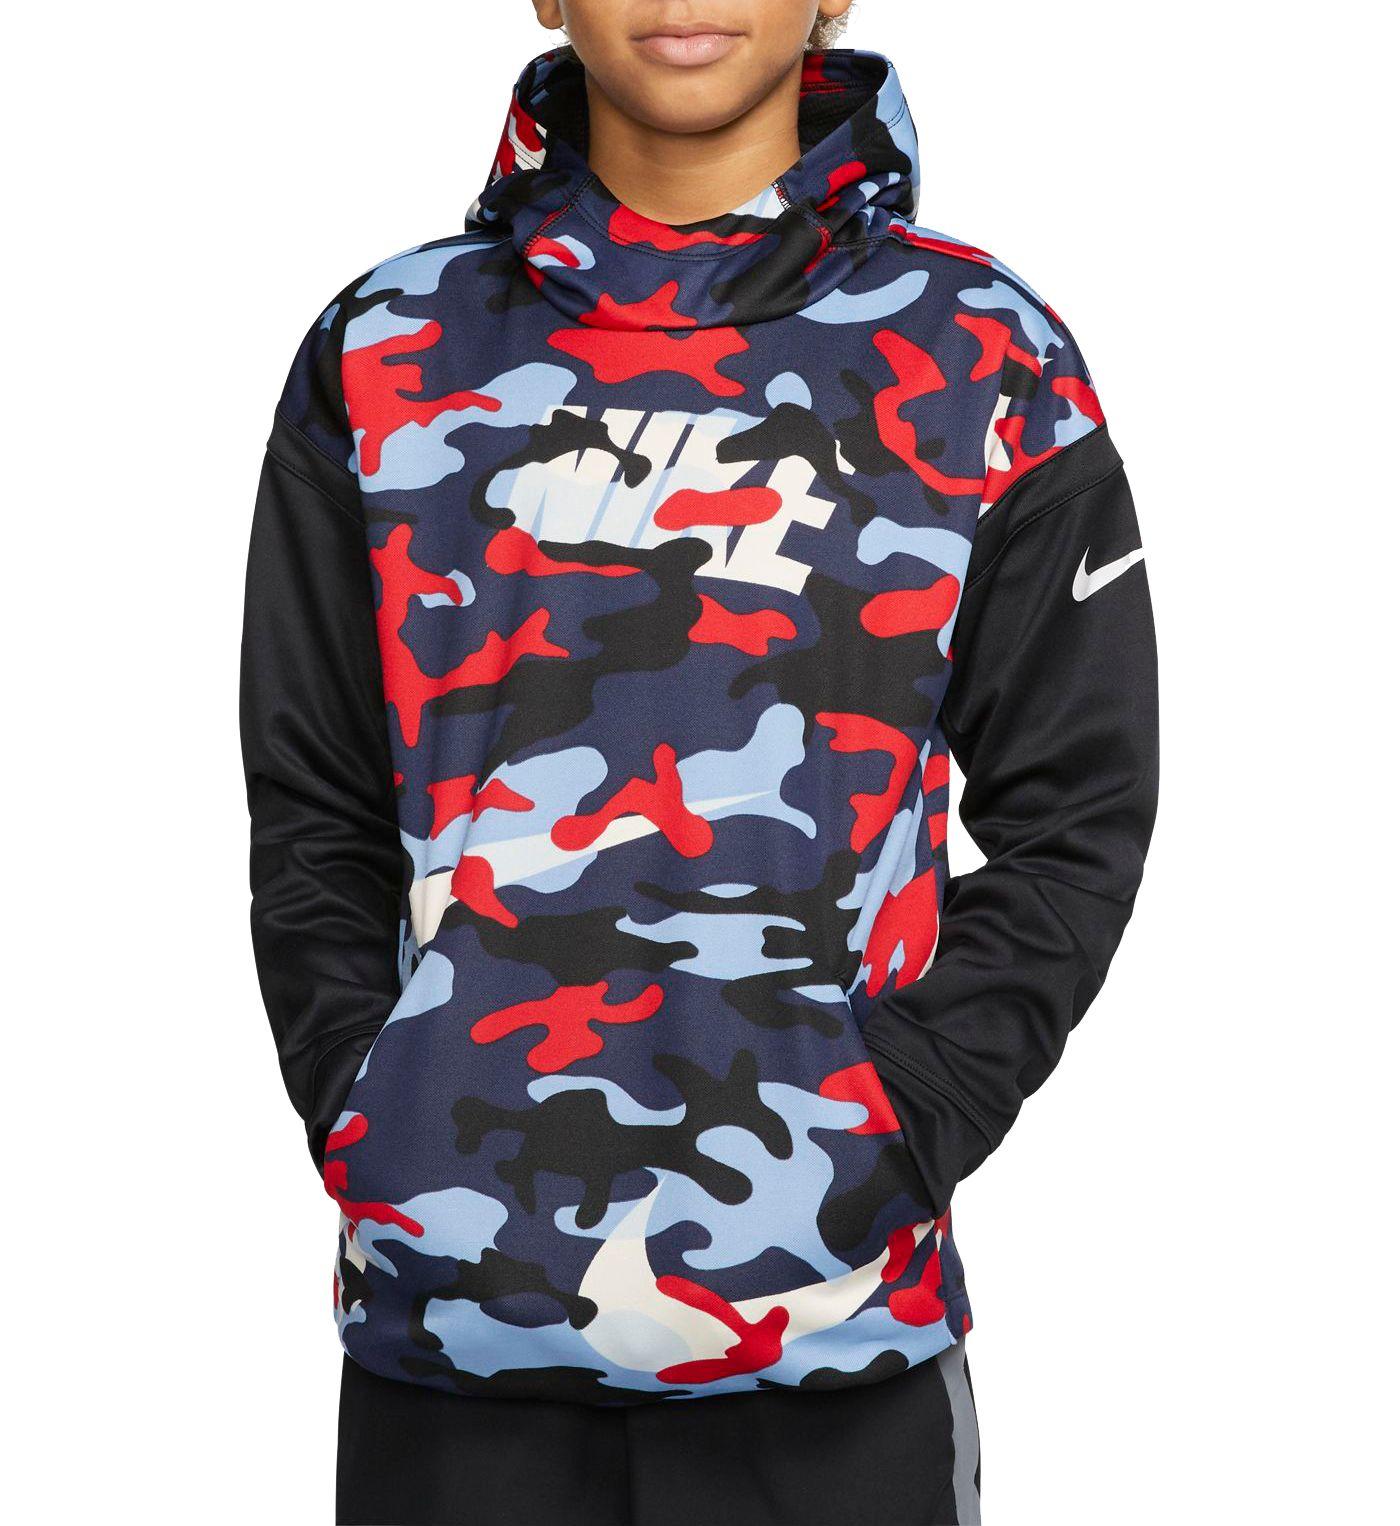 Nike Boys' Therma Camo Printed Hoodie